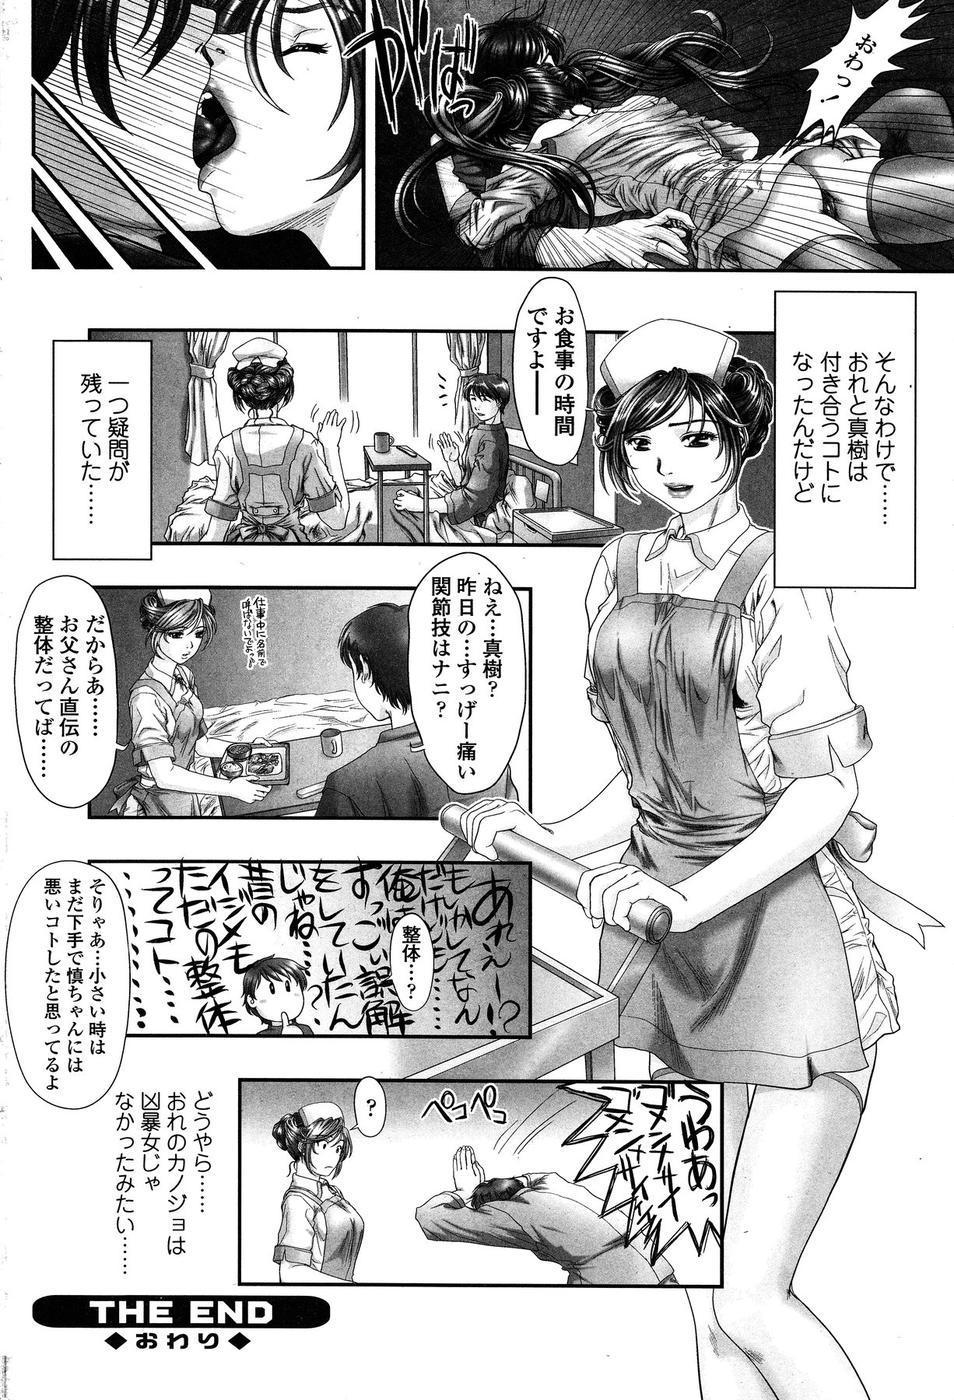 COMIC SIGMA 2009-01 Vol.28 36